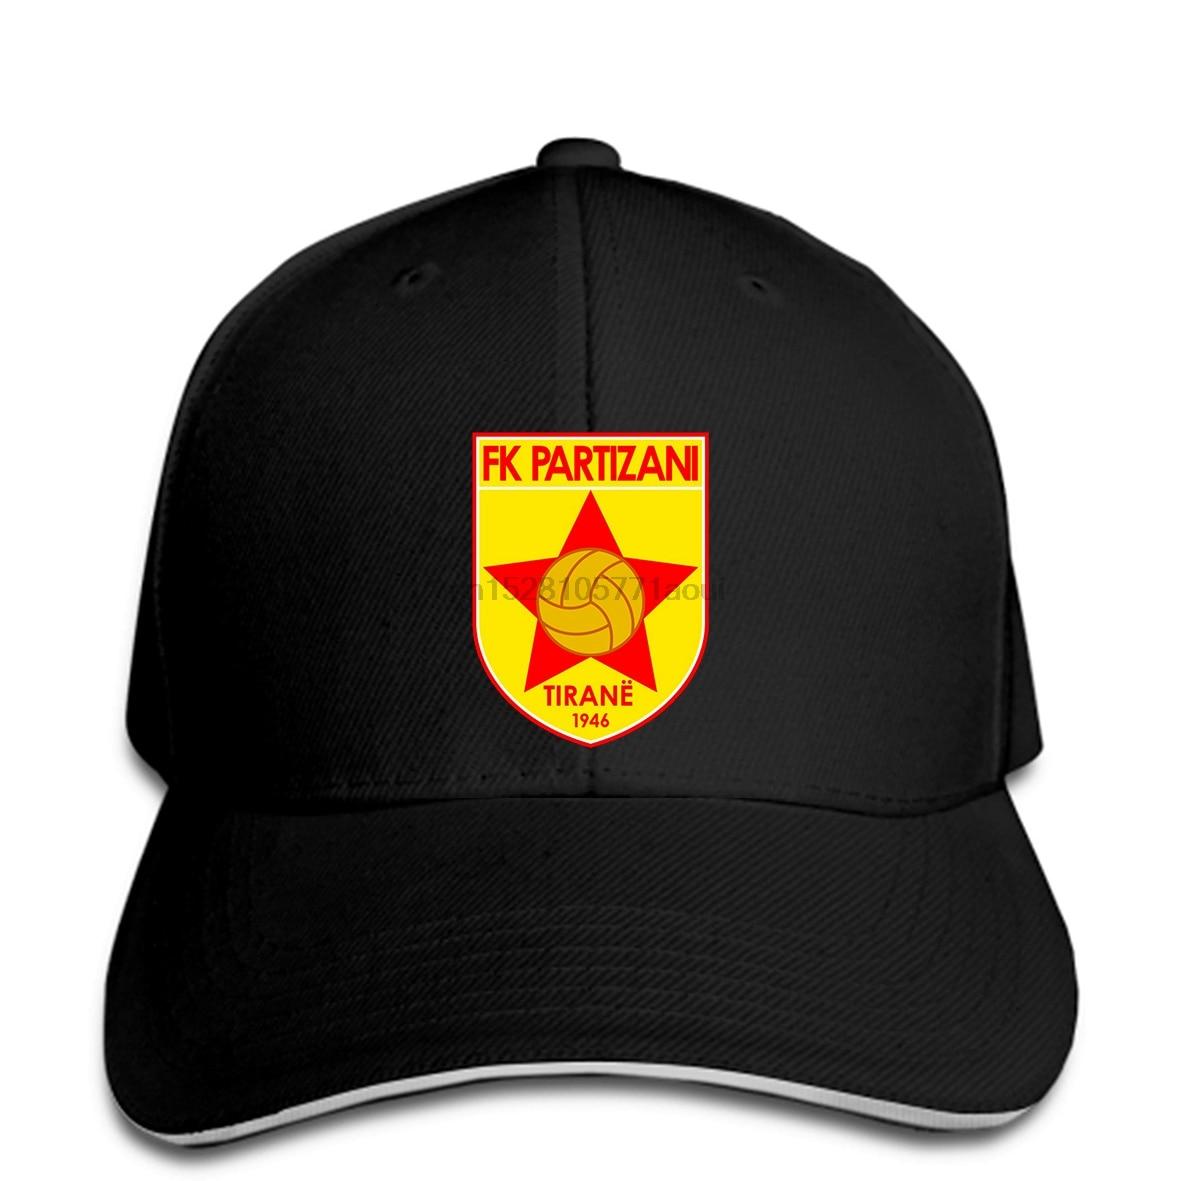 Baseball cap Fk Partizani Tirana Football Club Soccer Team Albanian Superliga Albania Print hat